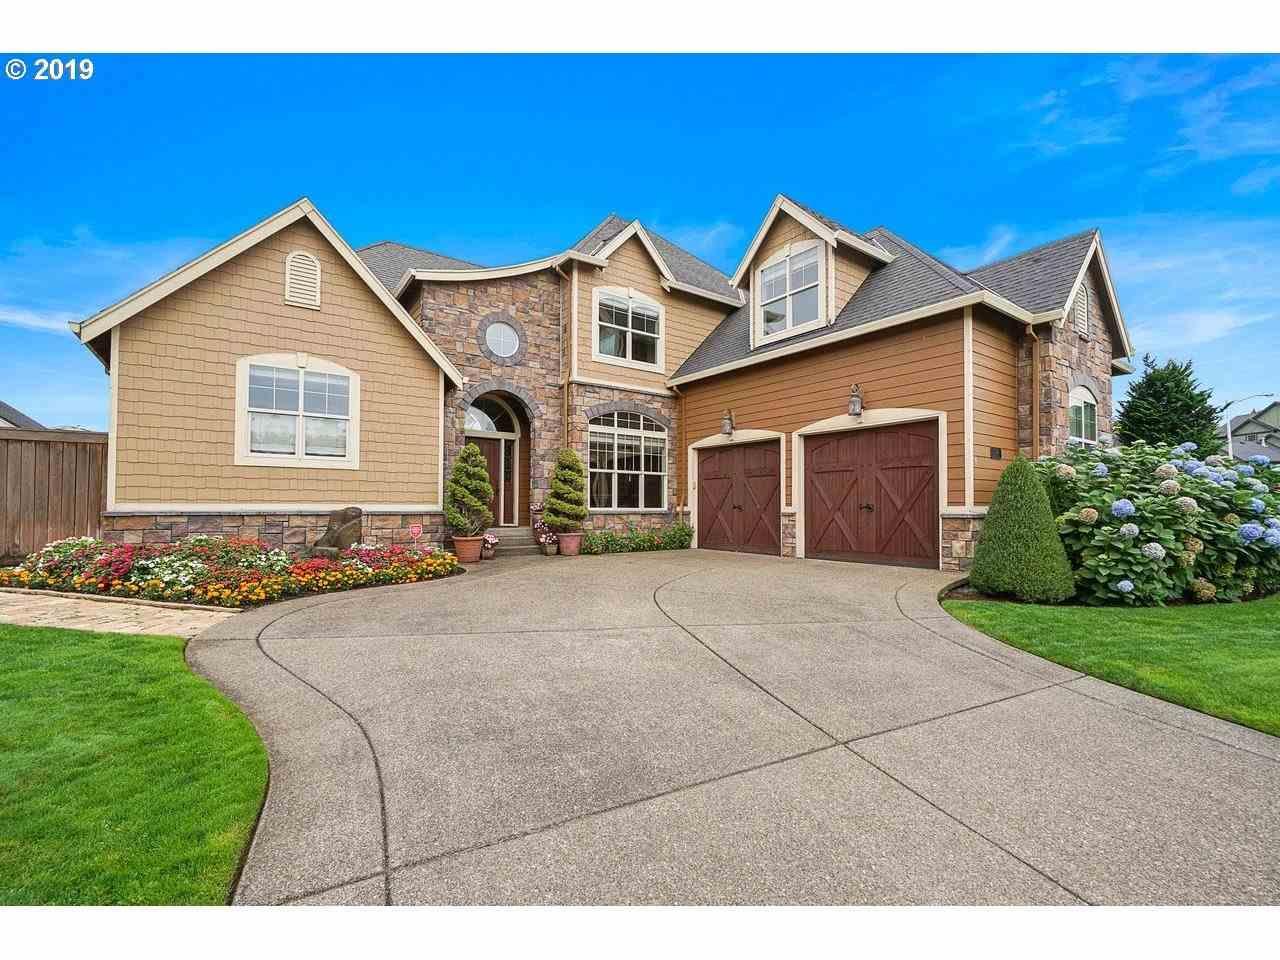 3502 Lavina Dr, Forest Grove, Oregon